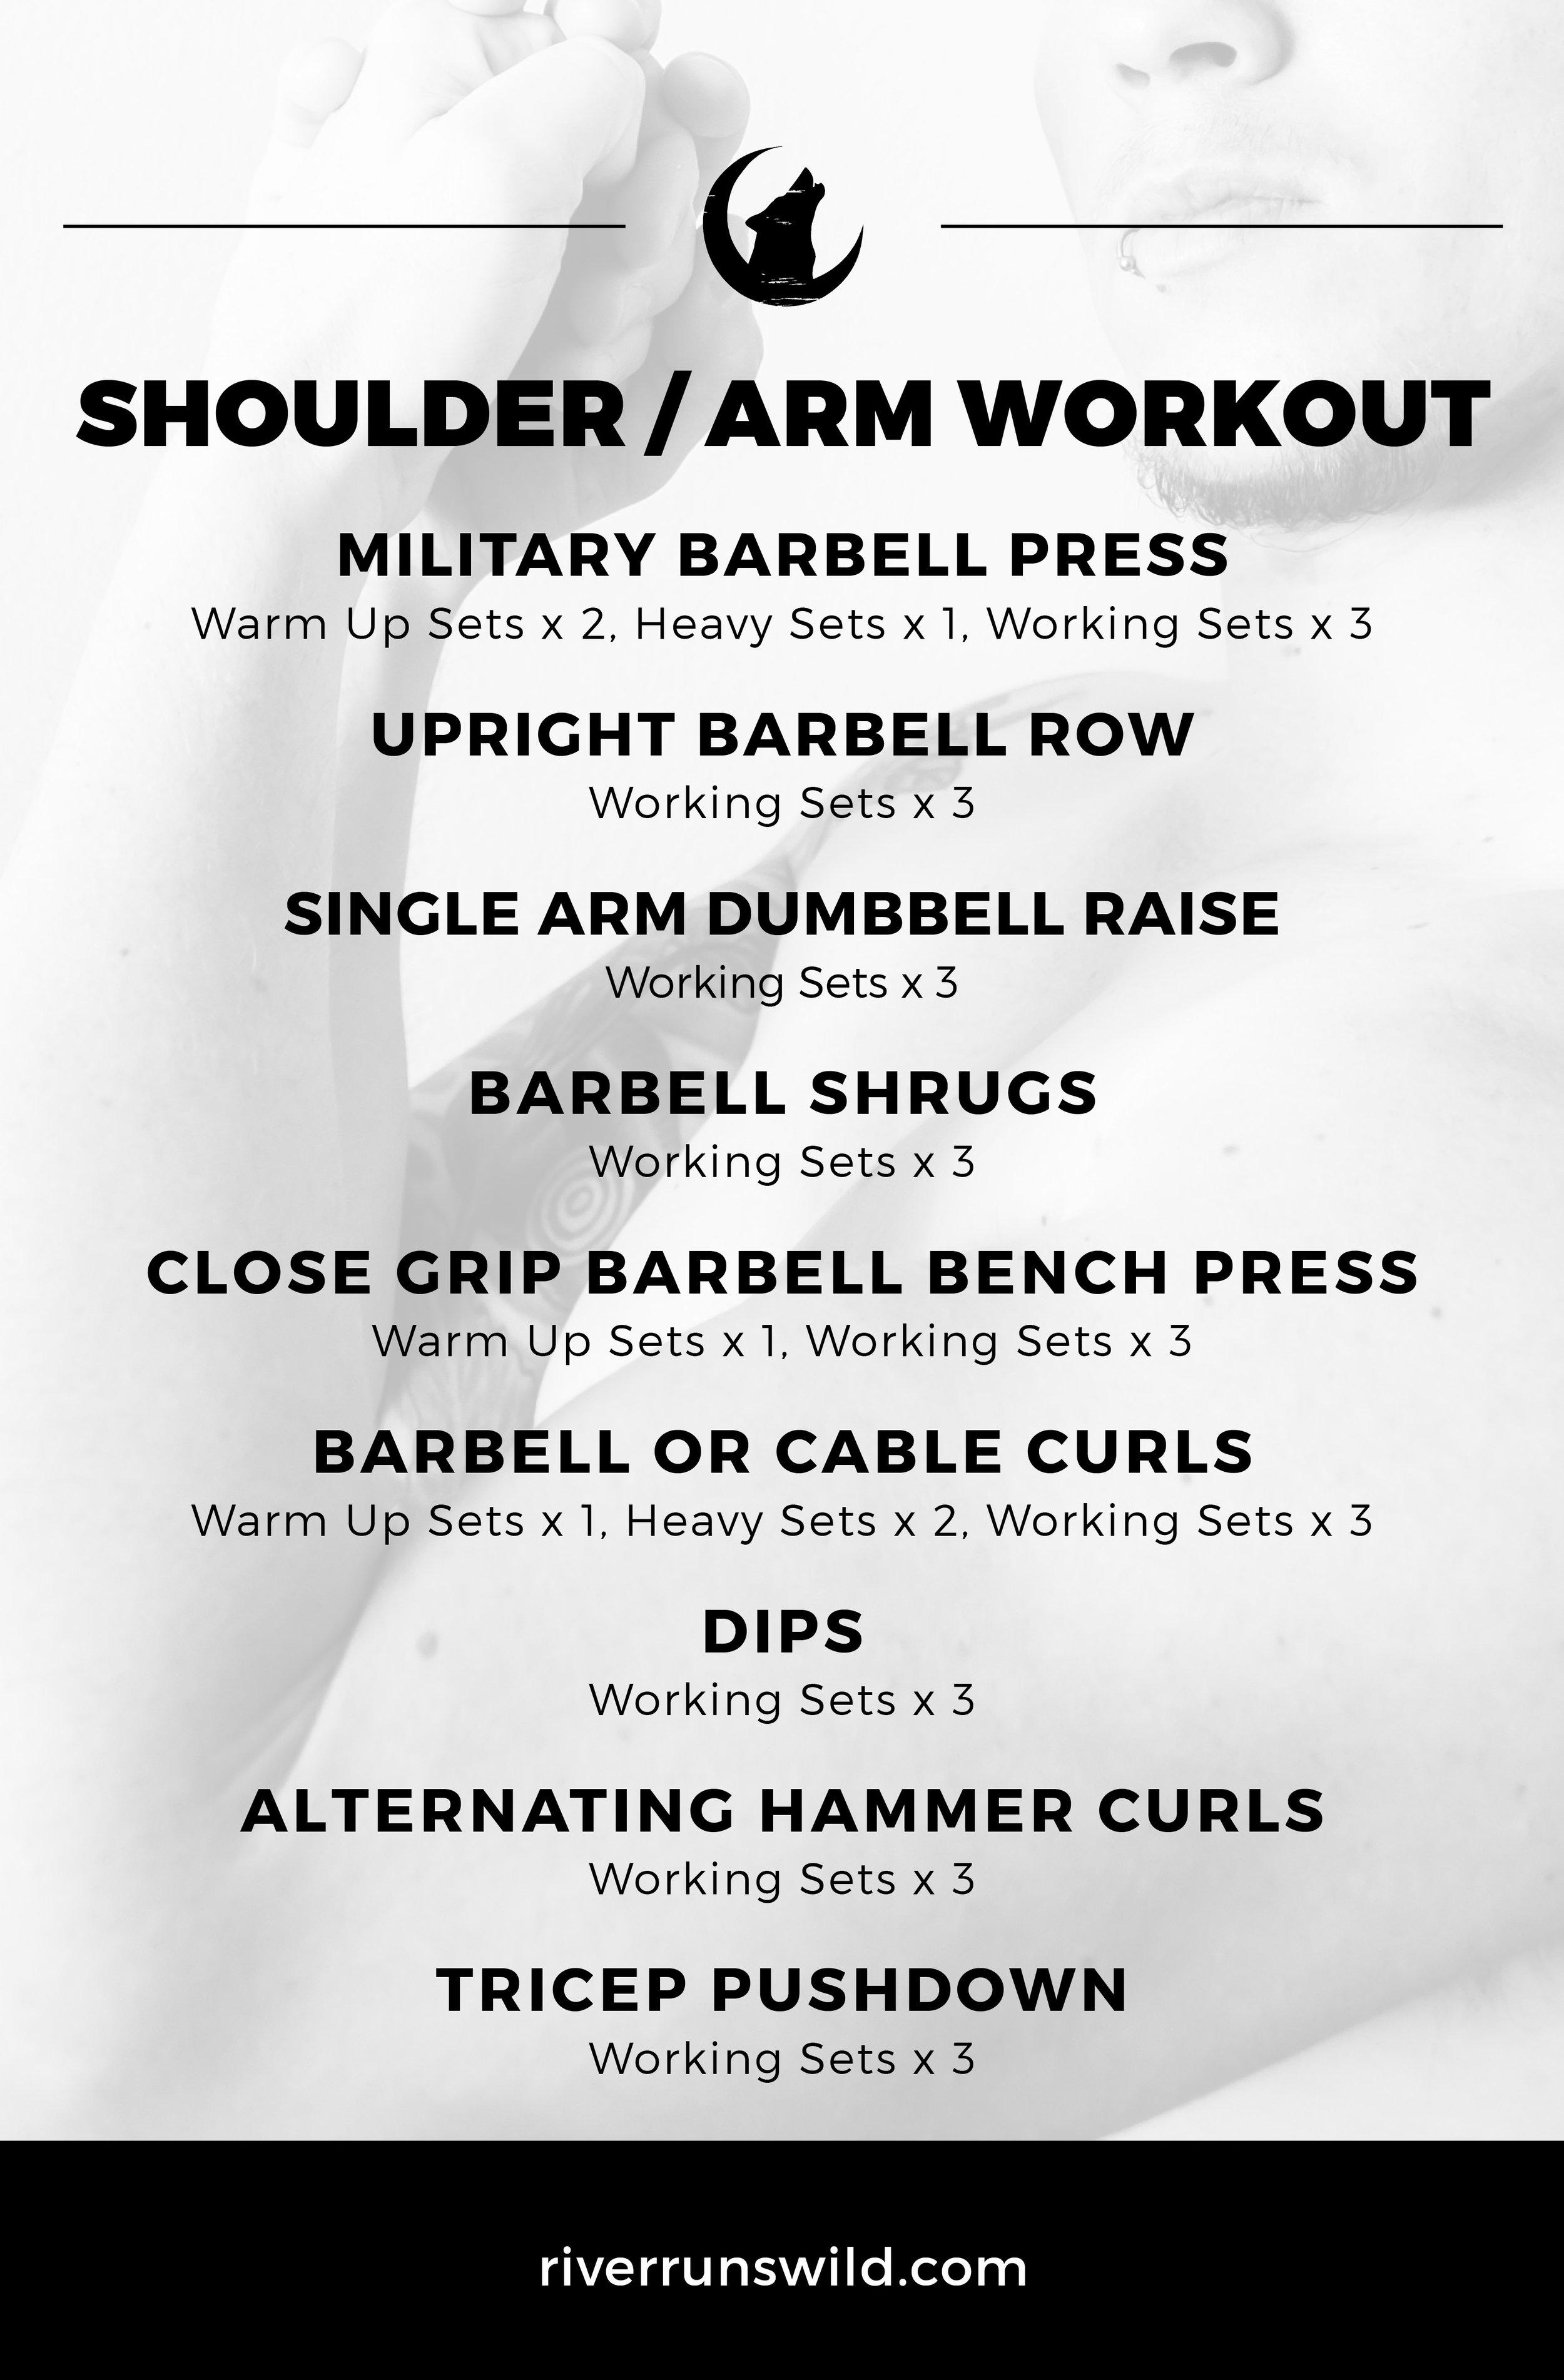 River-Runs-Wild-FTM-Fitness-Shoulder-Arm-Workout-Get-Bigger-Strength-Muscle-Bodybuilding-Trans-Workout-Training-Plan-Bulk.jpeg